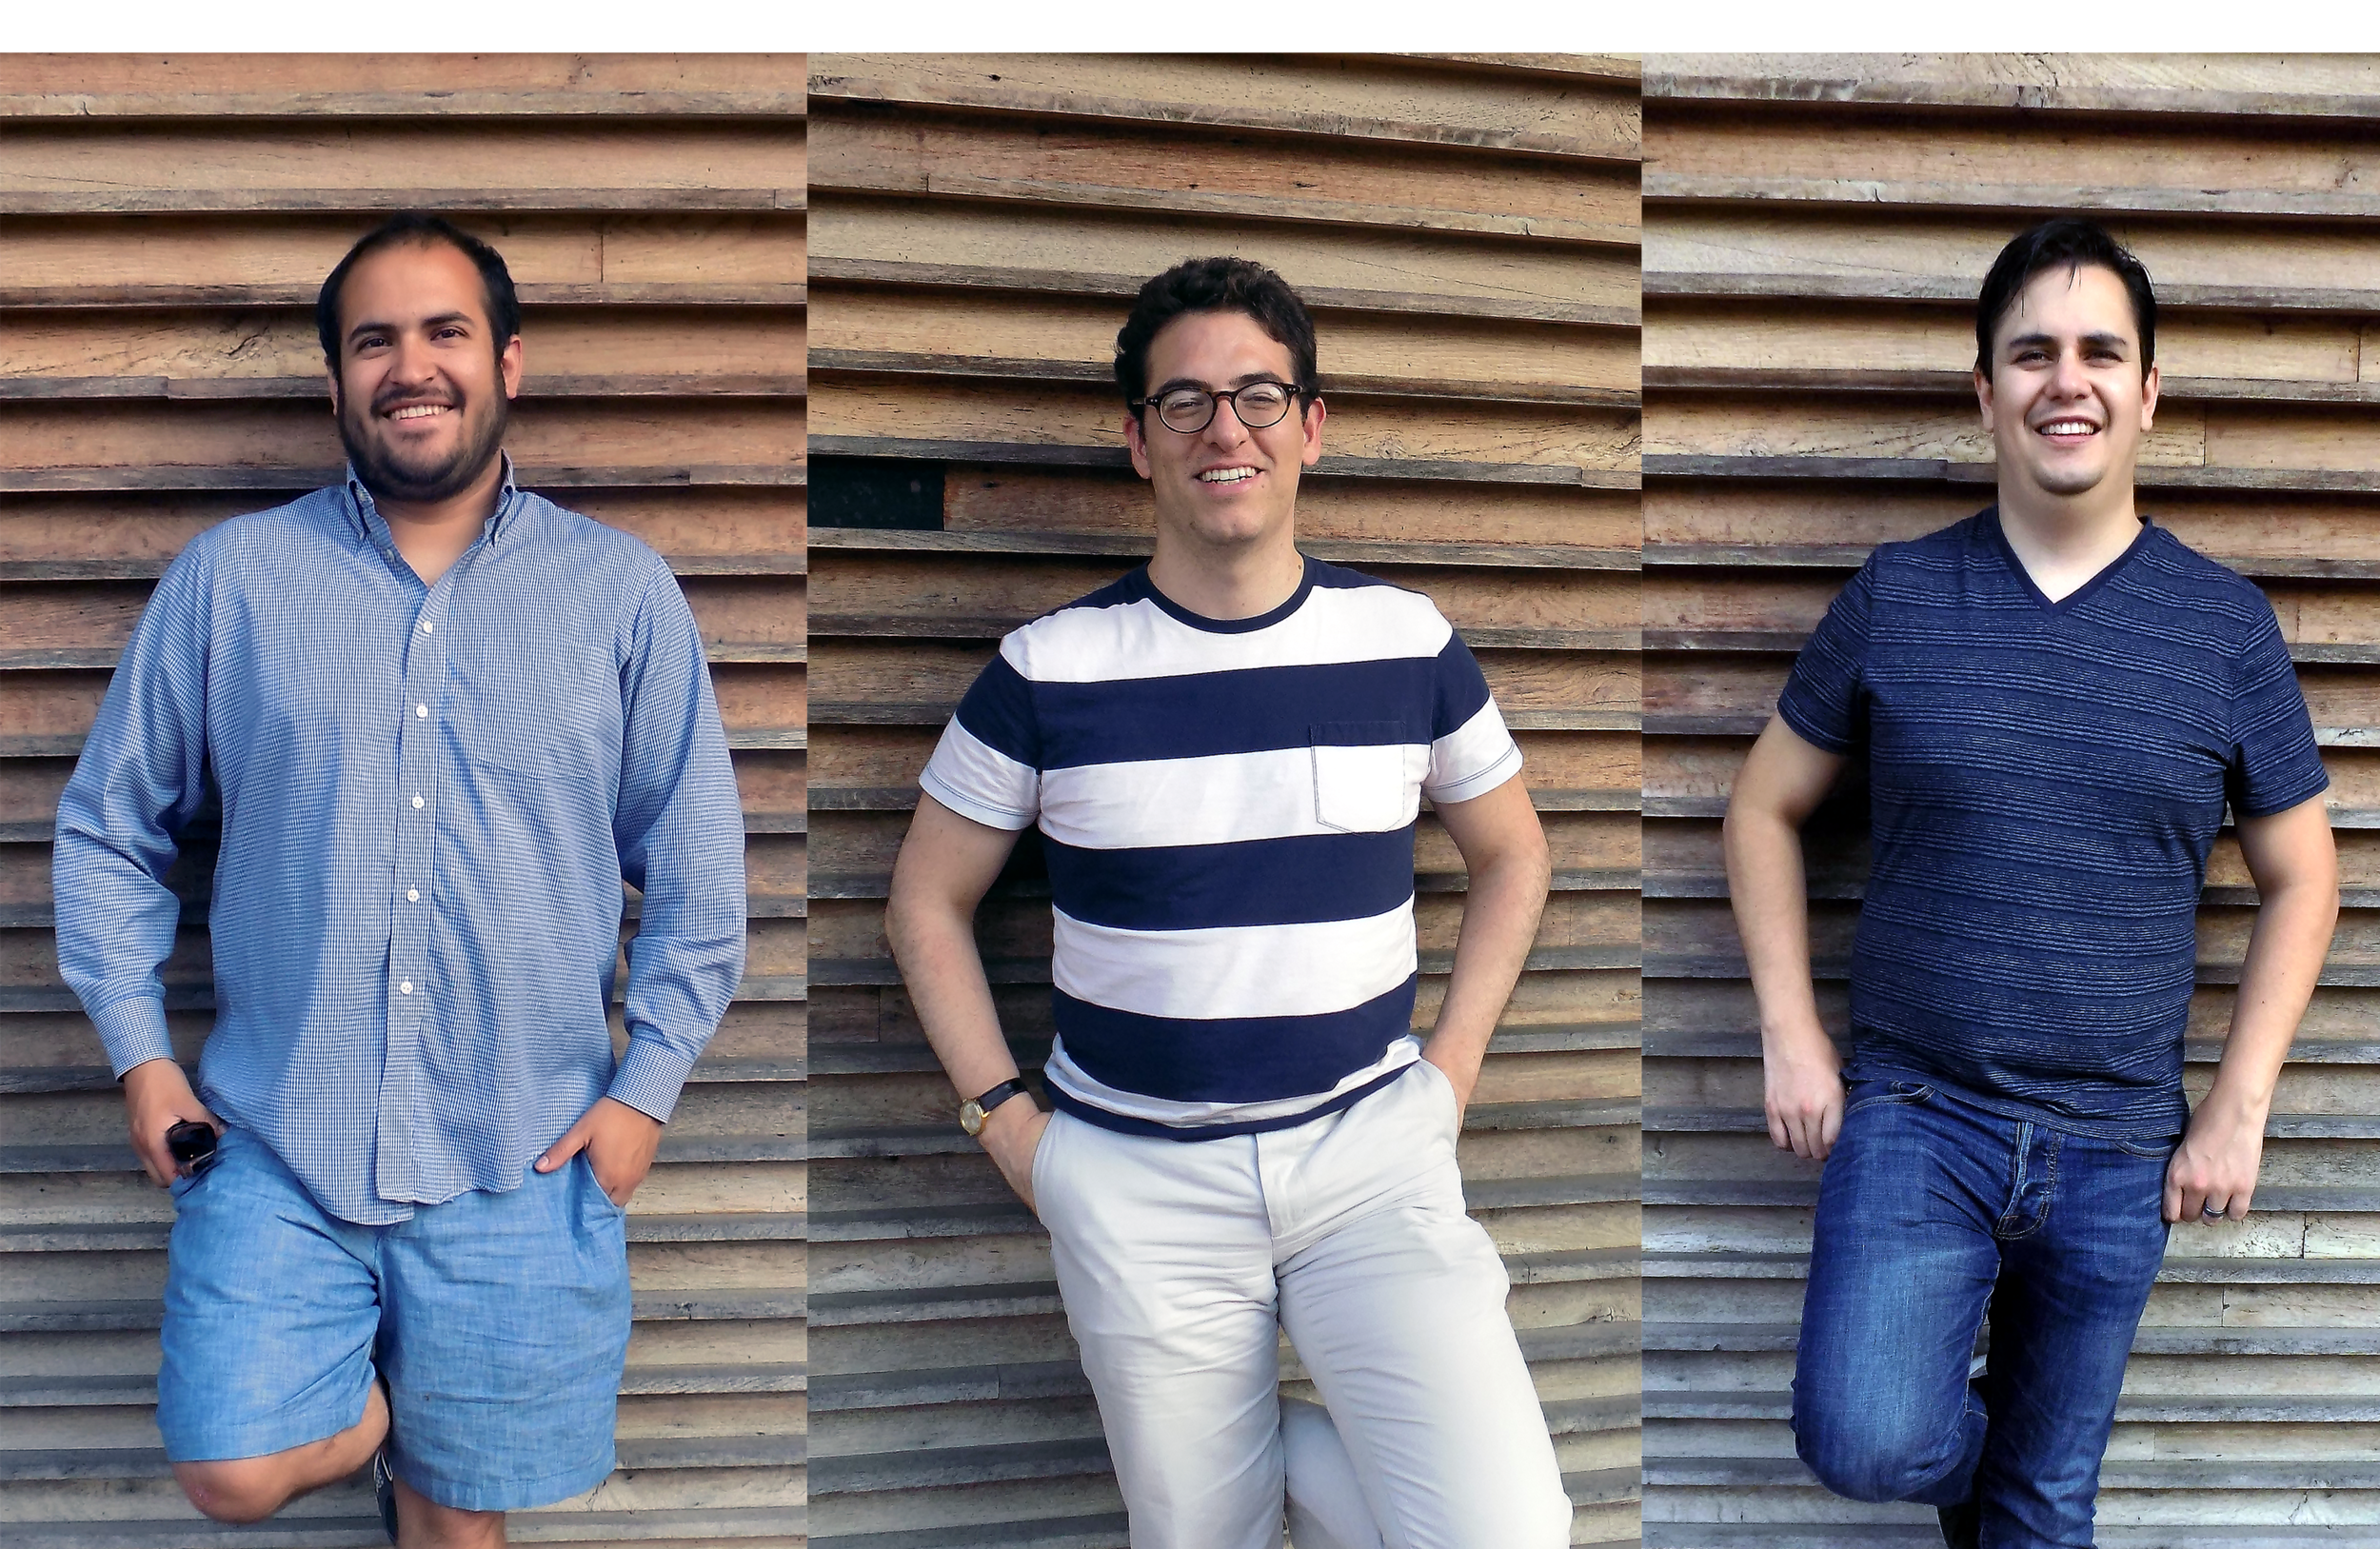 From left to right: Juan Manuel Balcazar, Matias Arnal, and Rodrigo Diaz